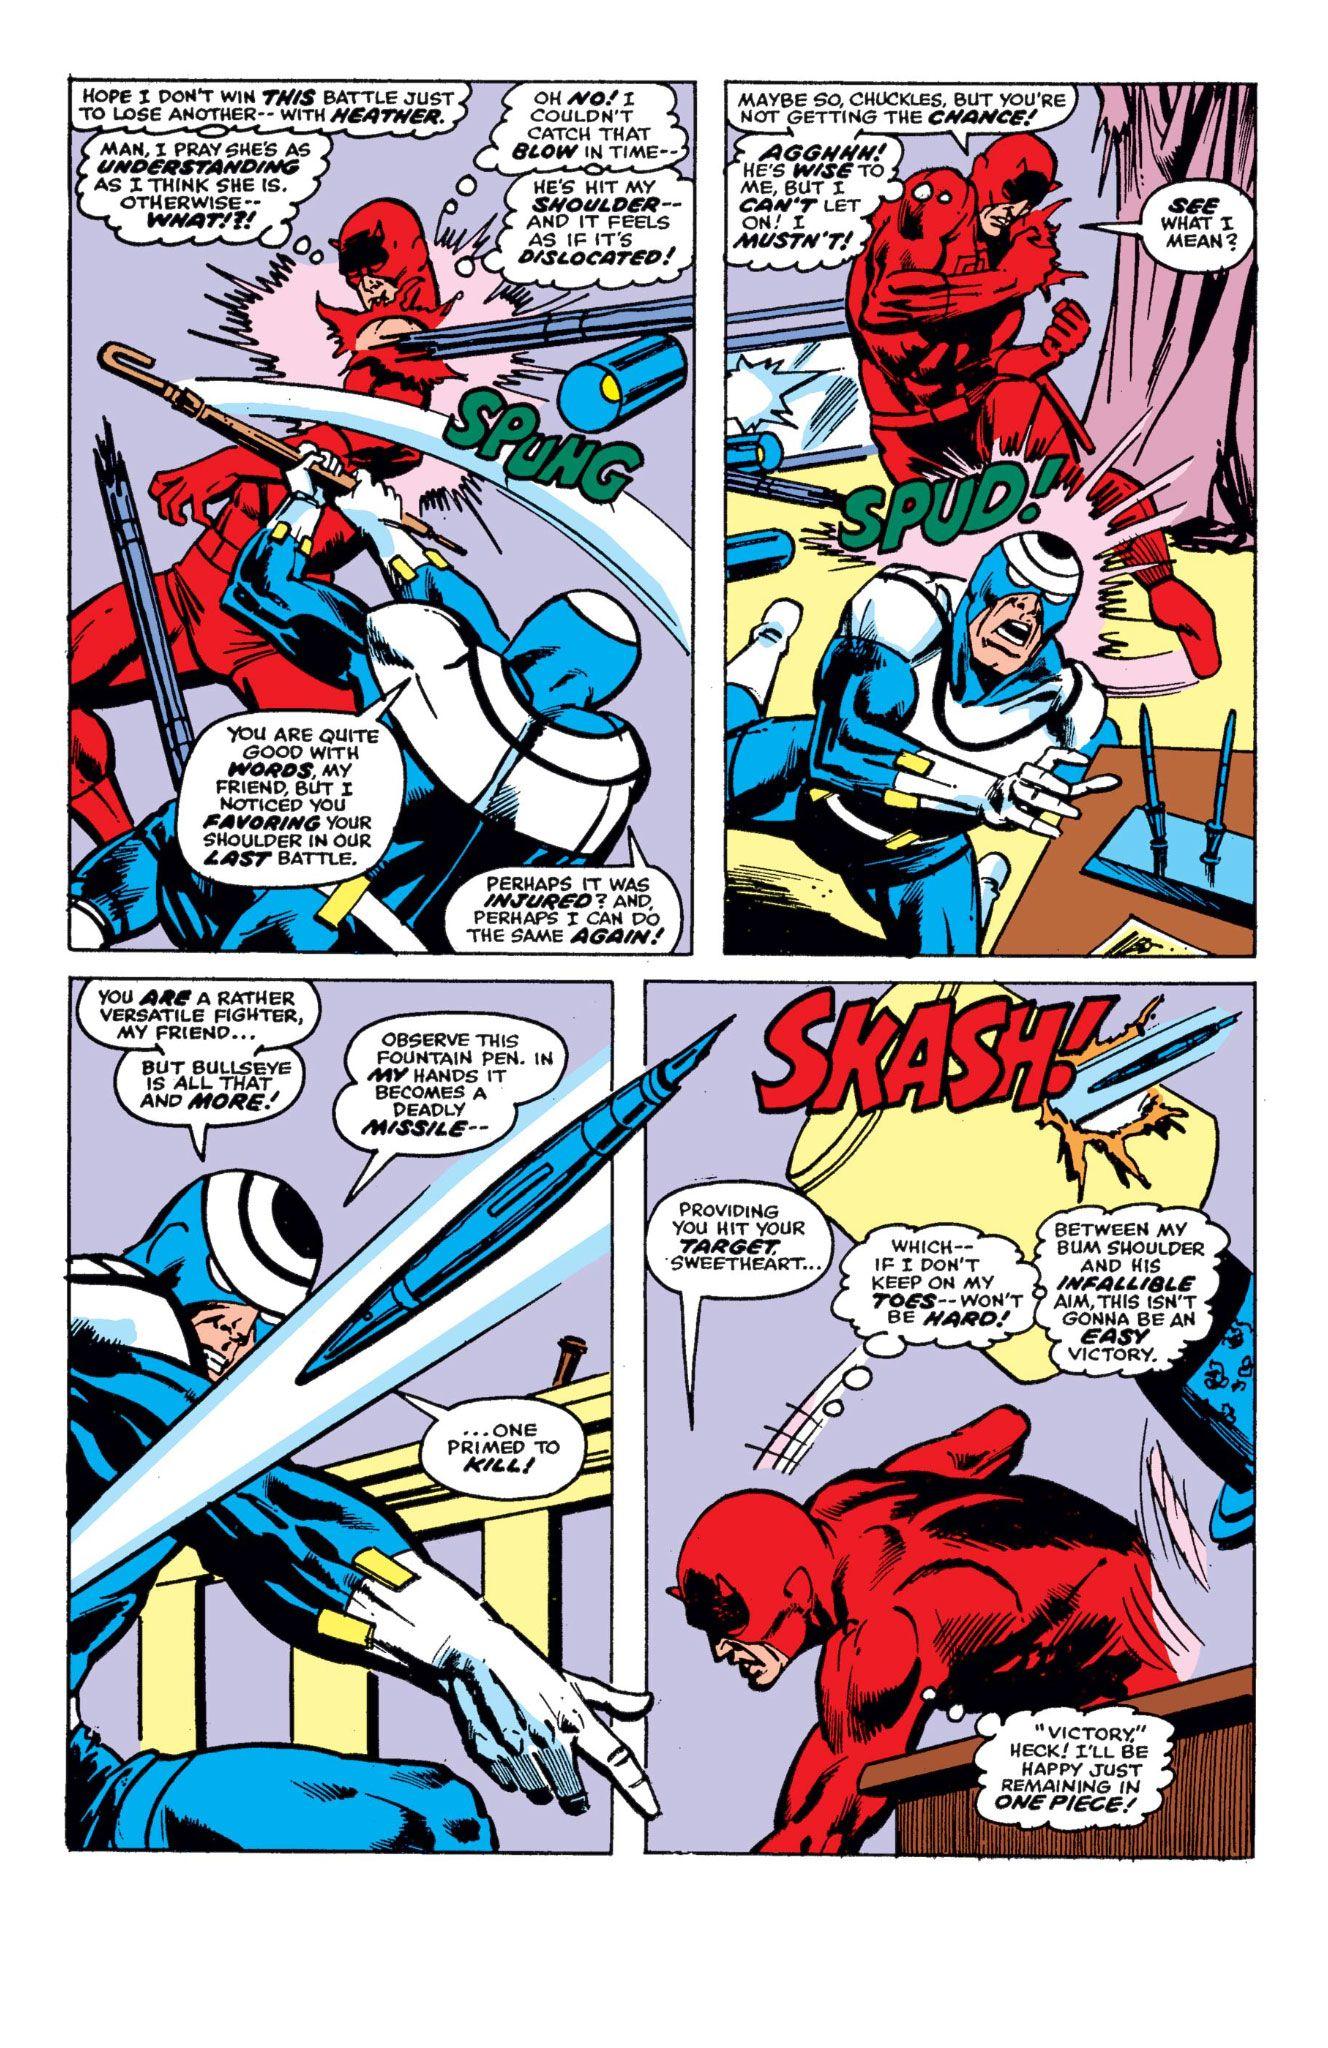 Daredevil's Bullseye: Comics Origins and Netflix Evolution